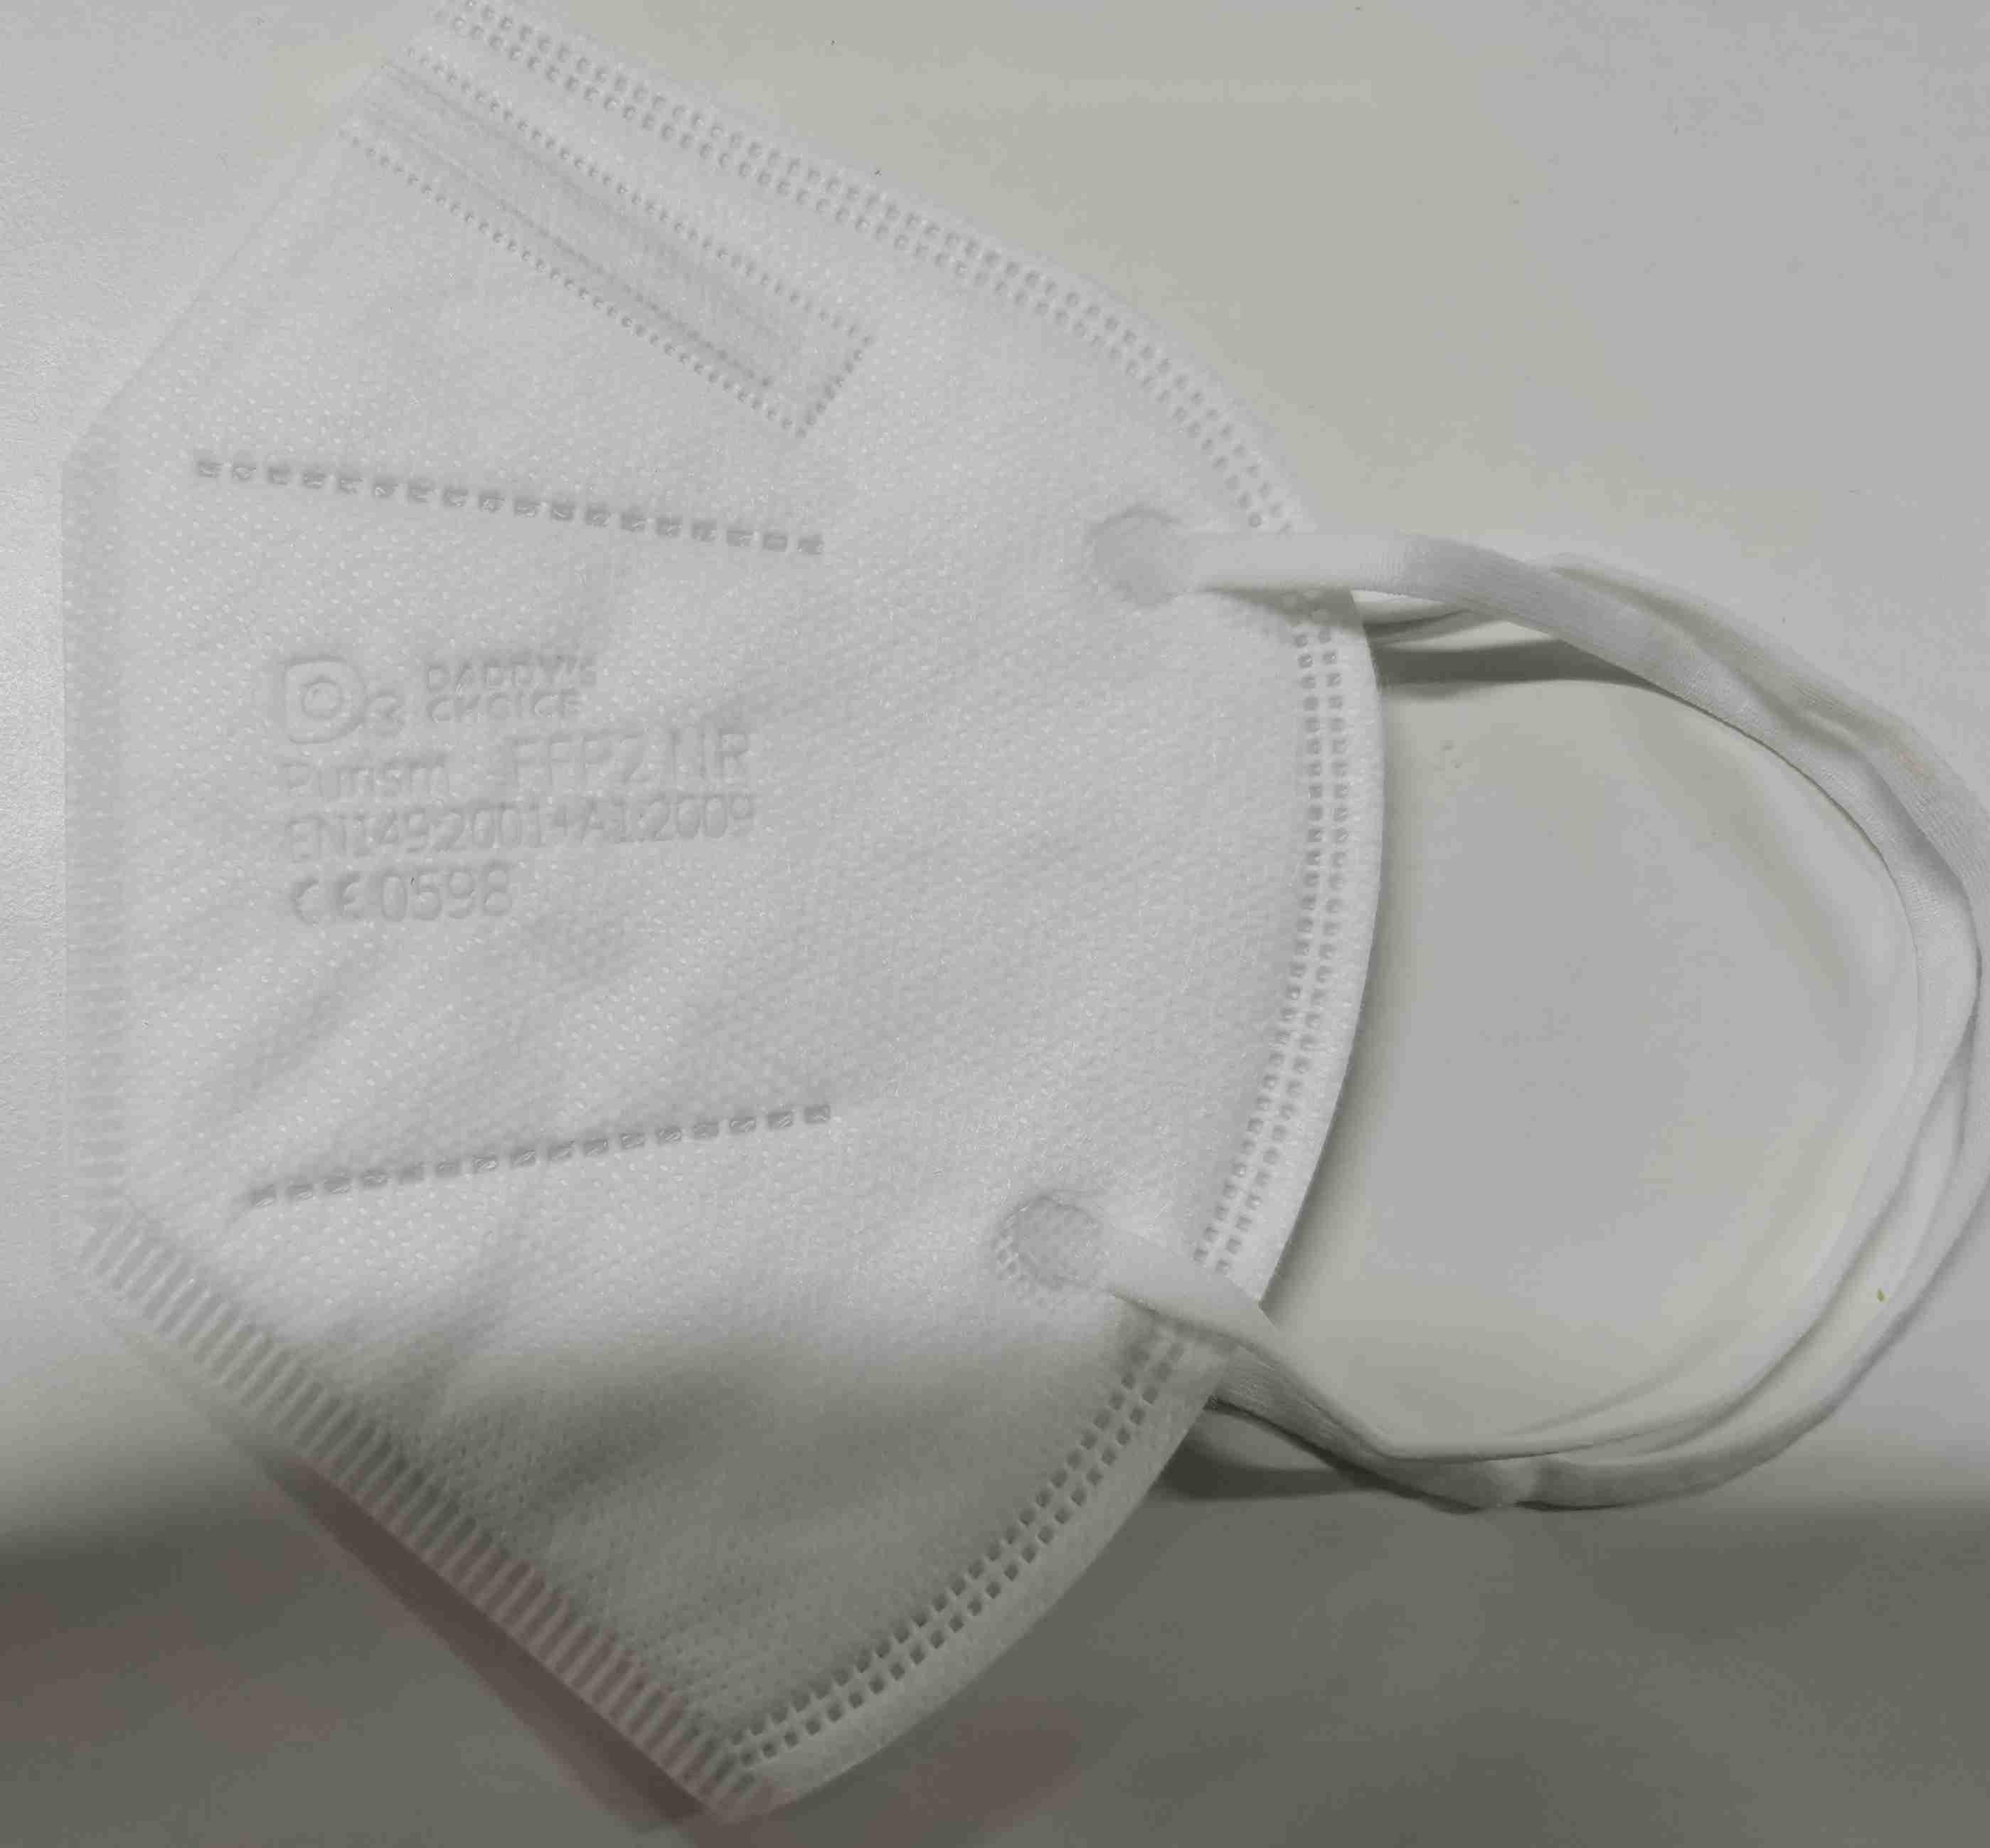 AKTION, FFP2 Masken, CE zertifiziert,  SET 20STK